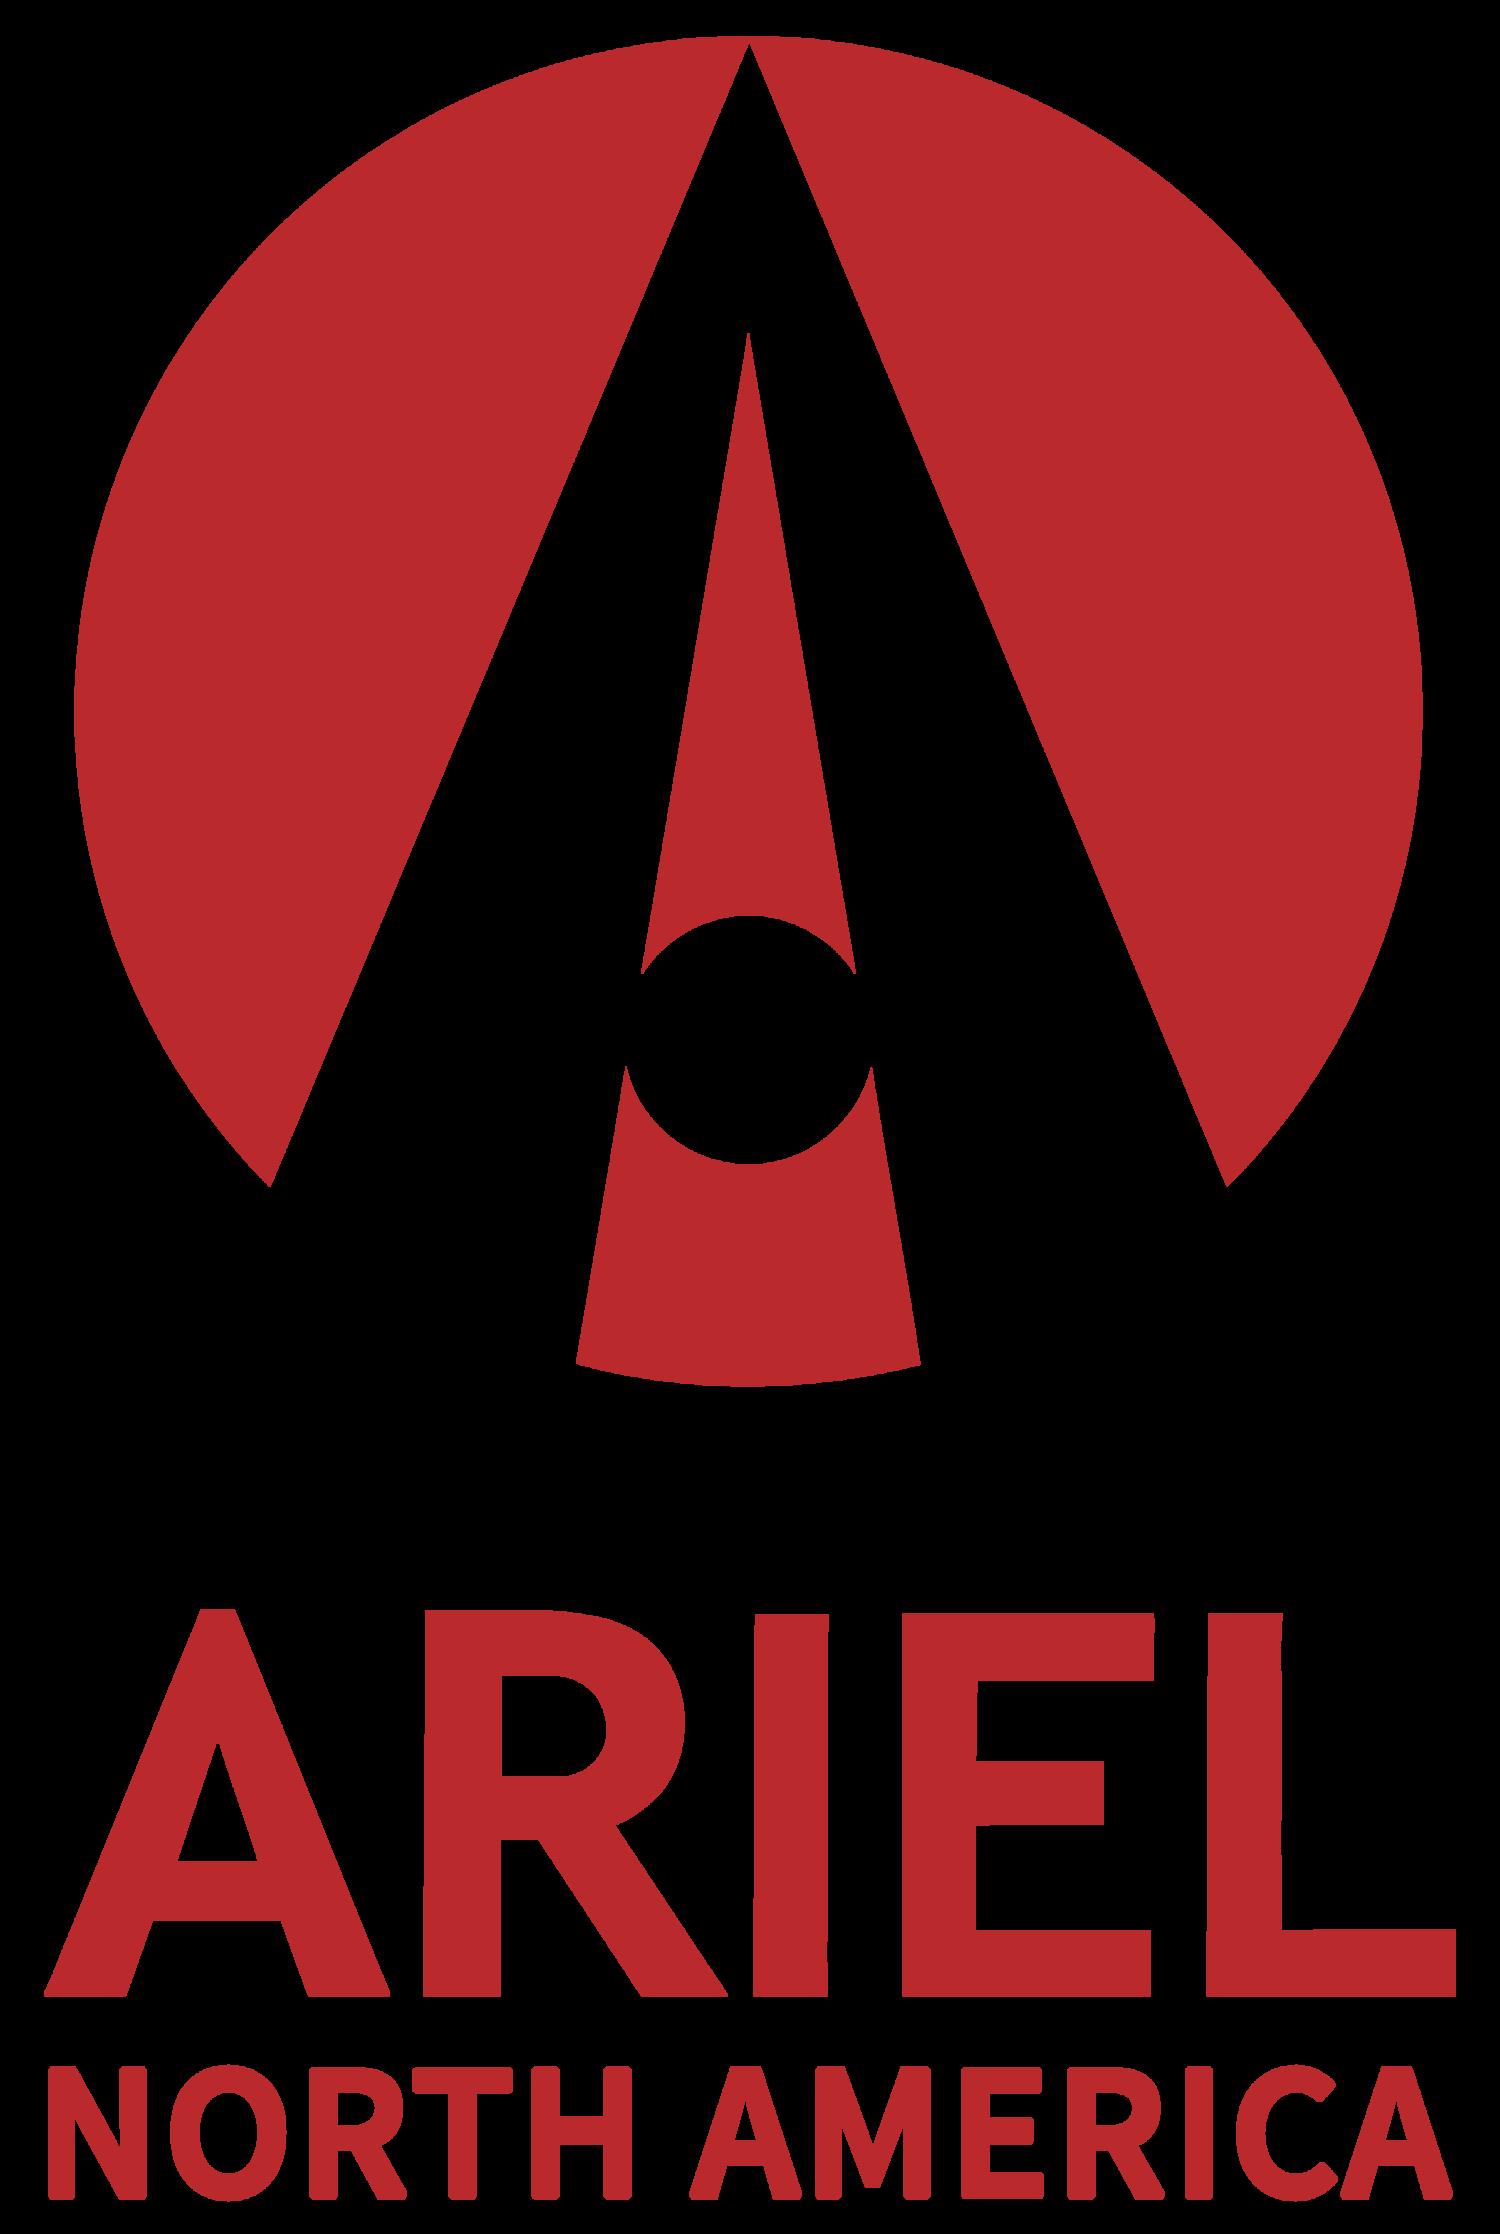 ariel atom ariel nomad ariel north america news ariel north america